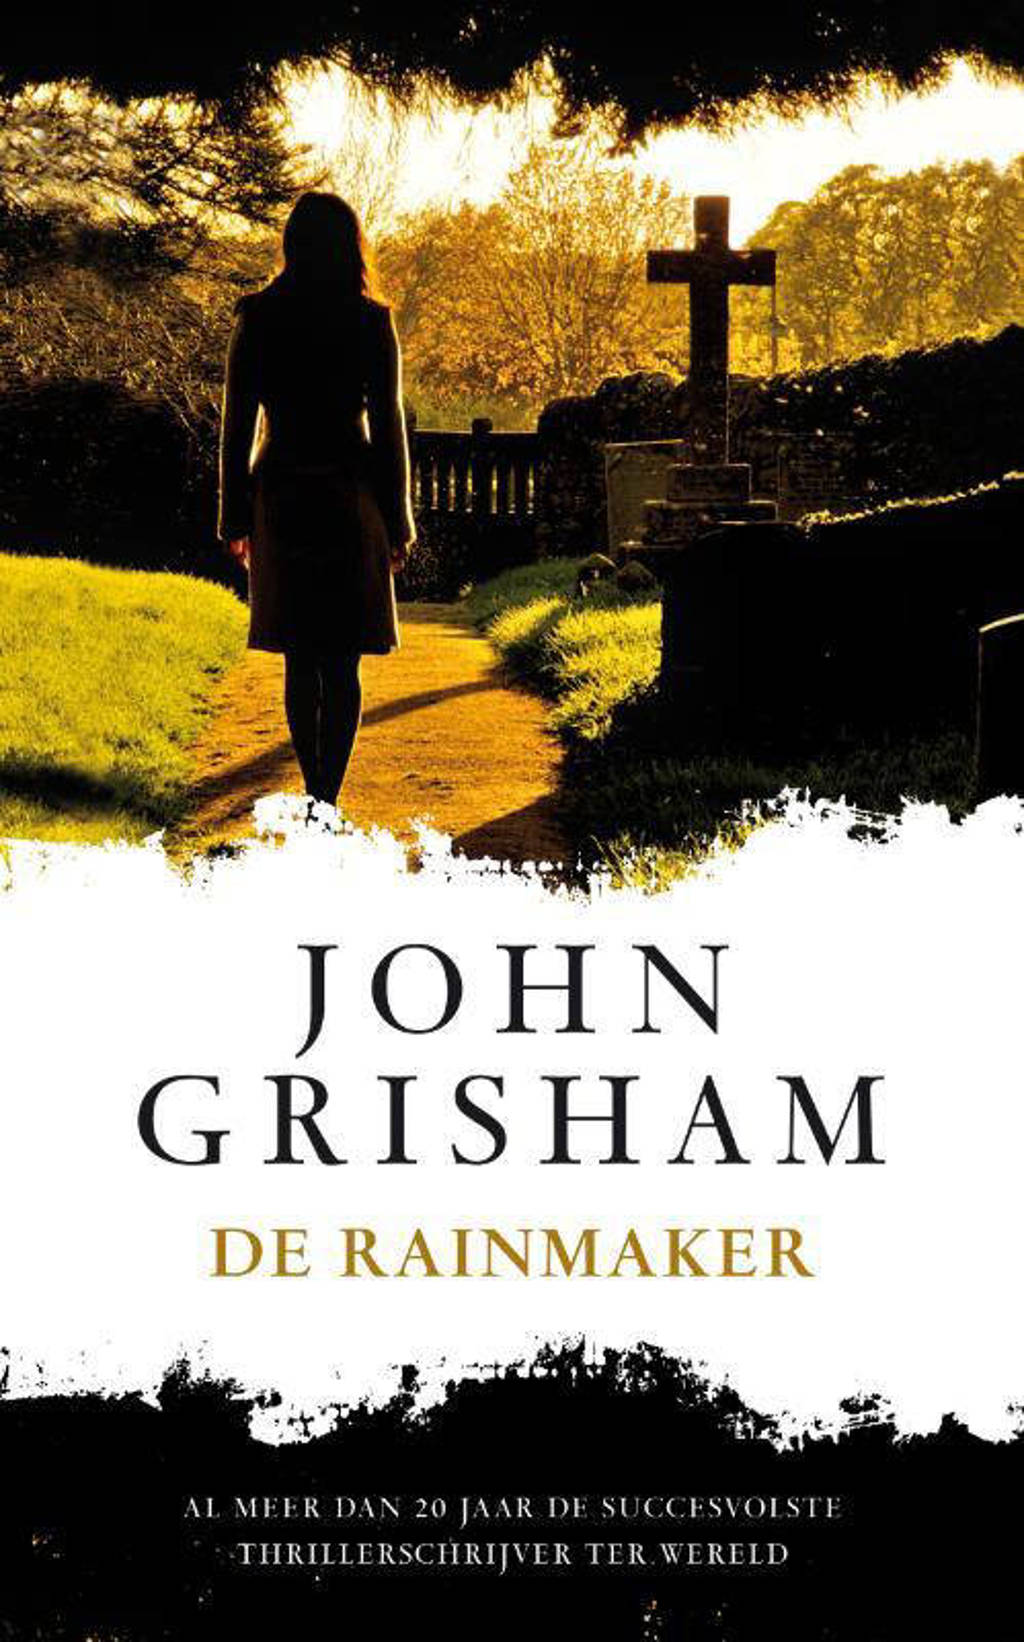 De rainmaker - John Grisham